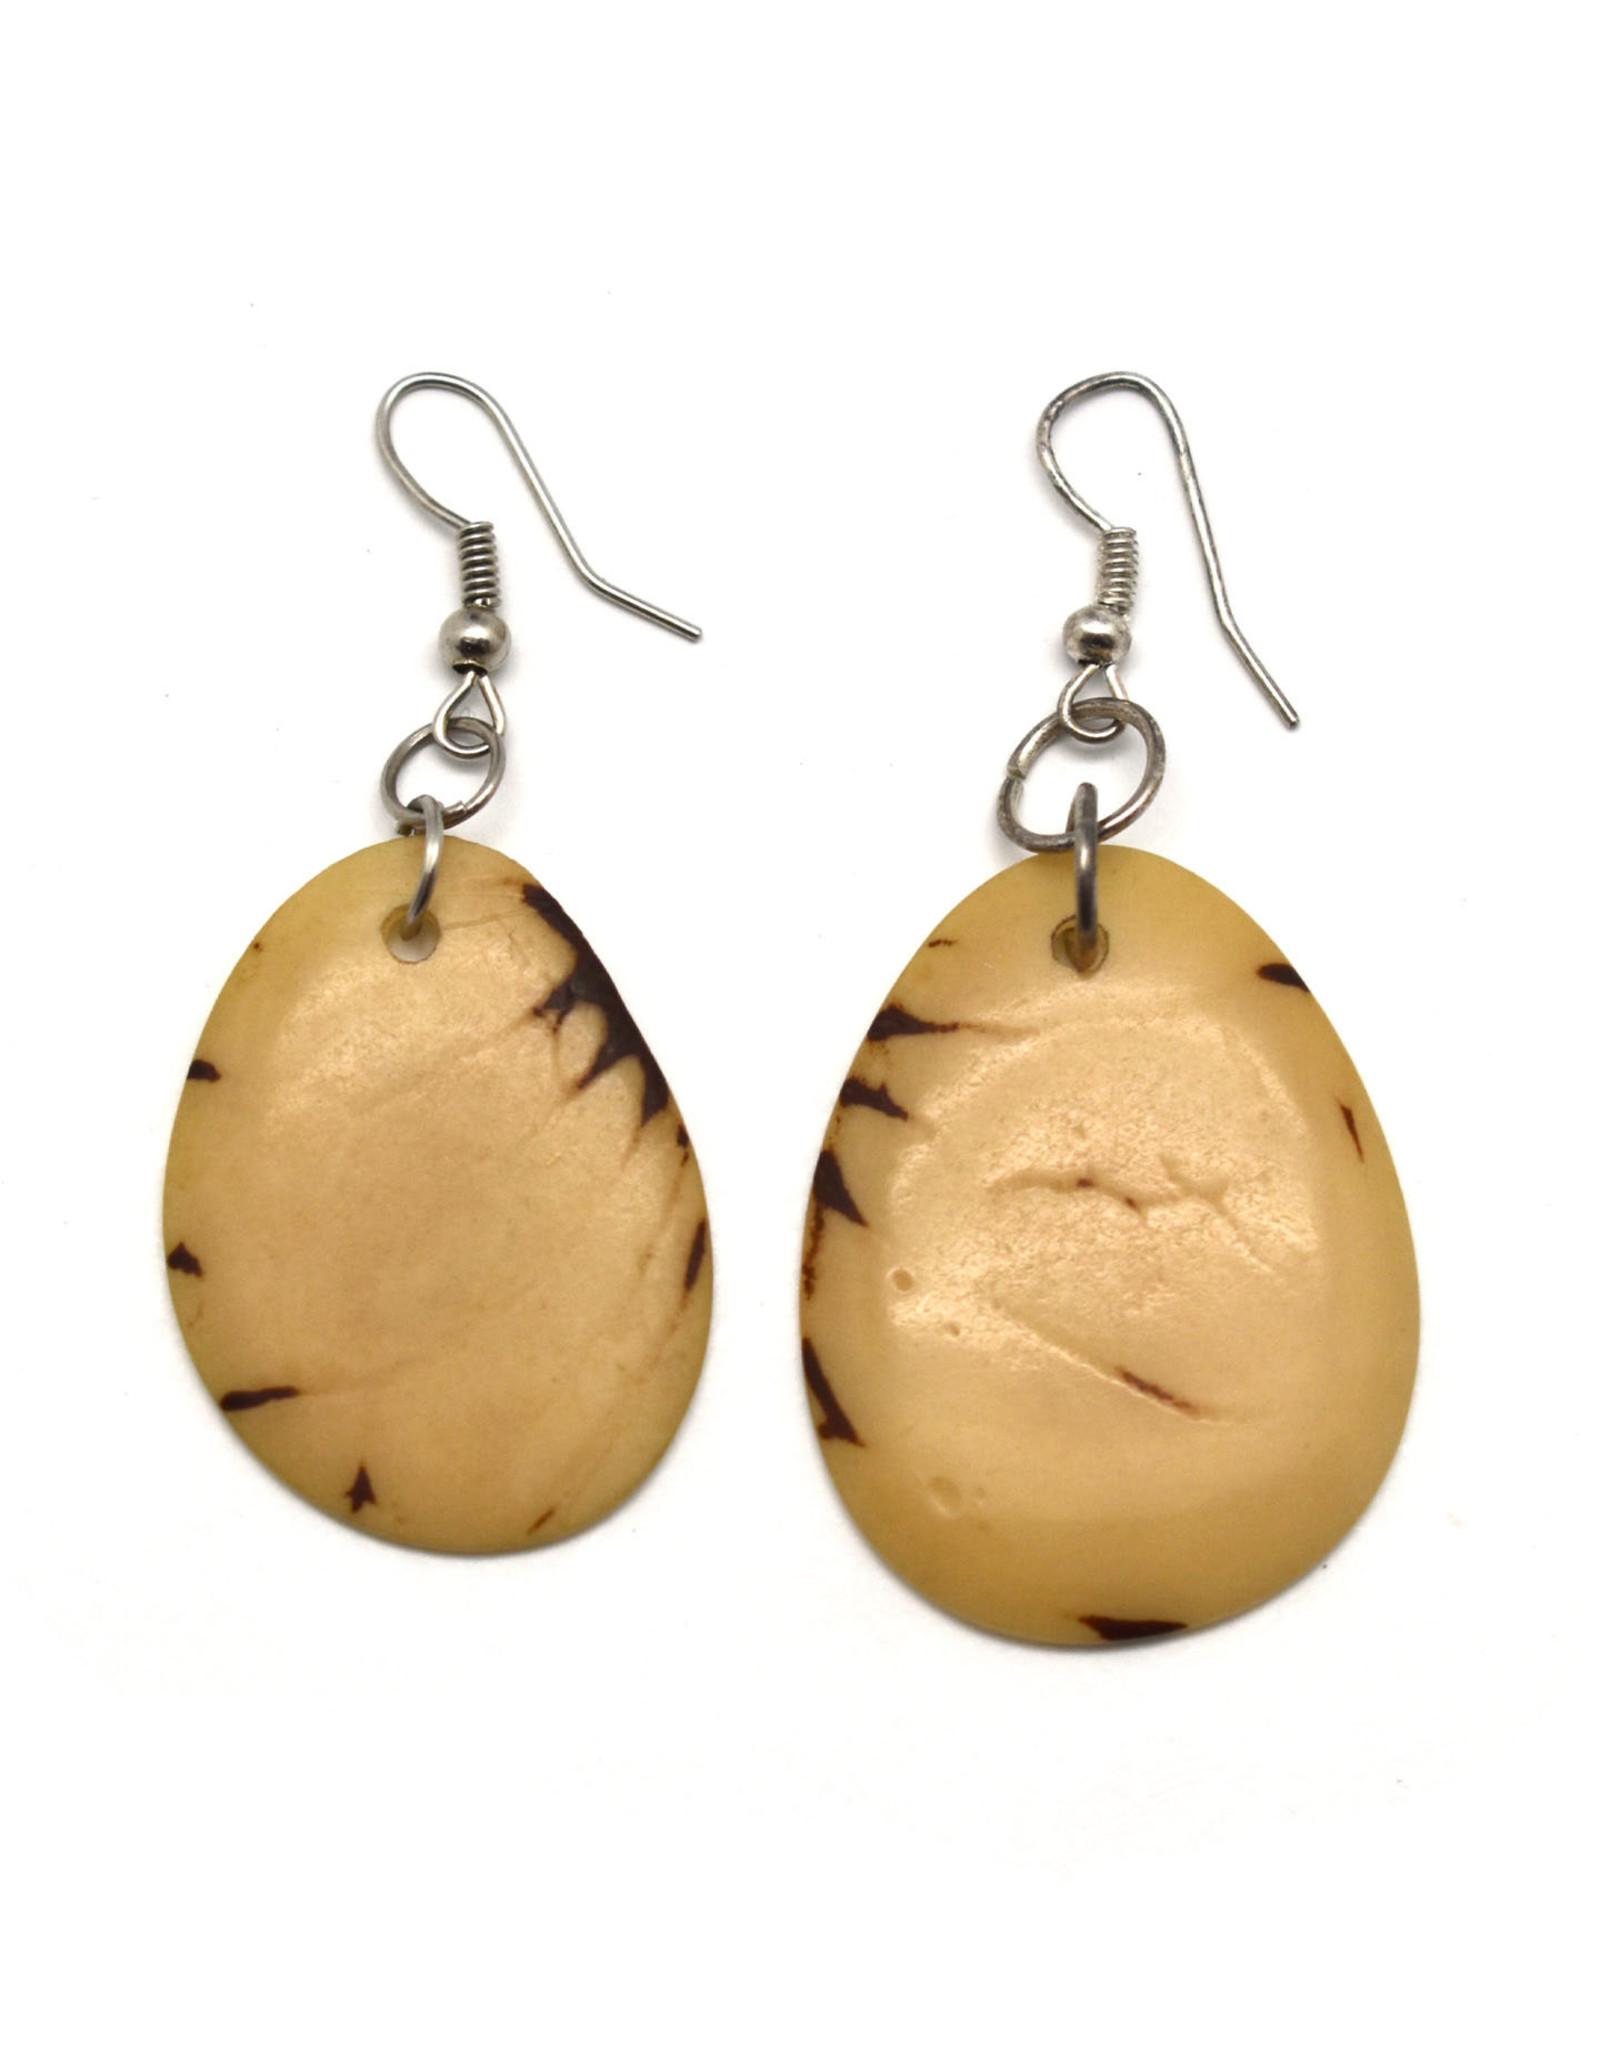 Tagua Nut Earrings - Natural